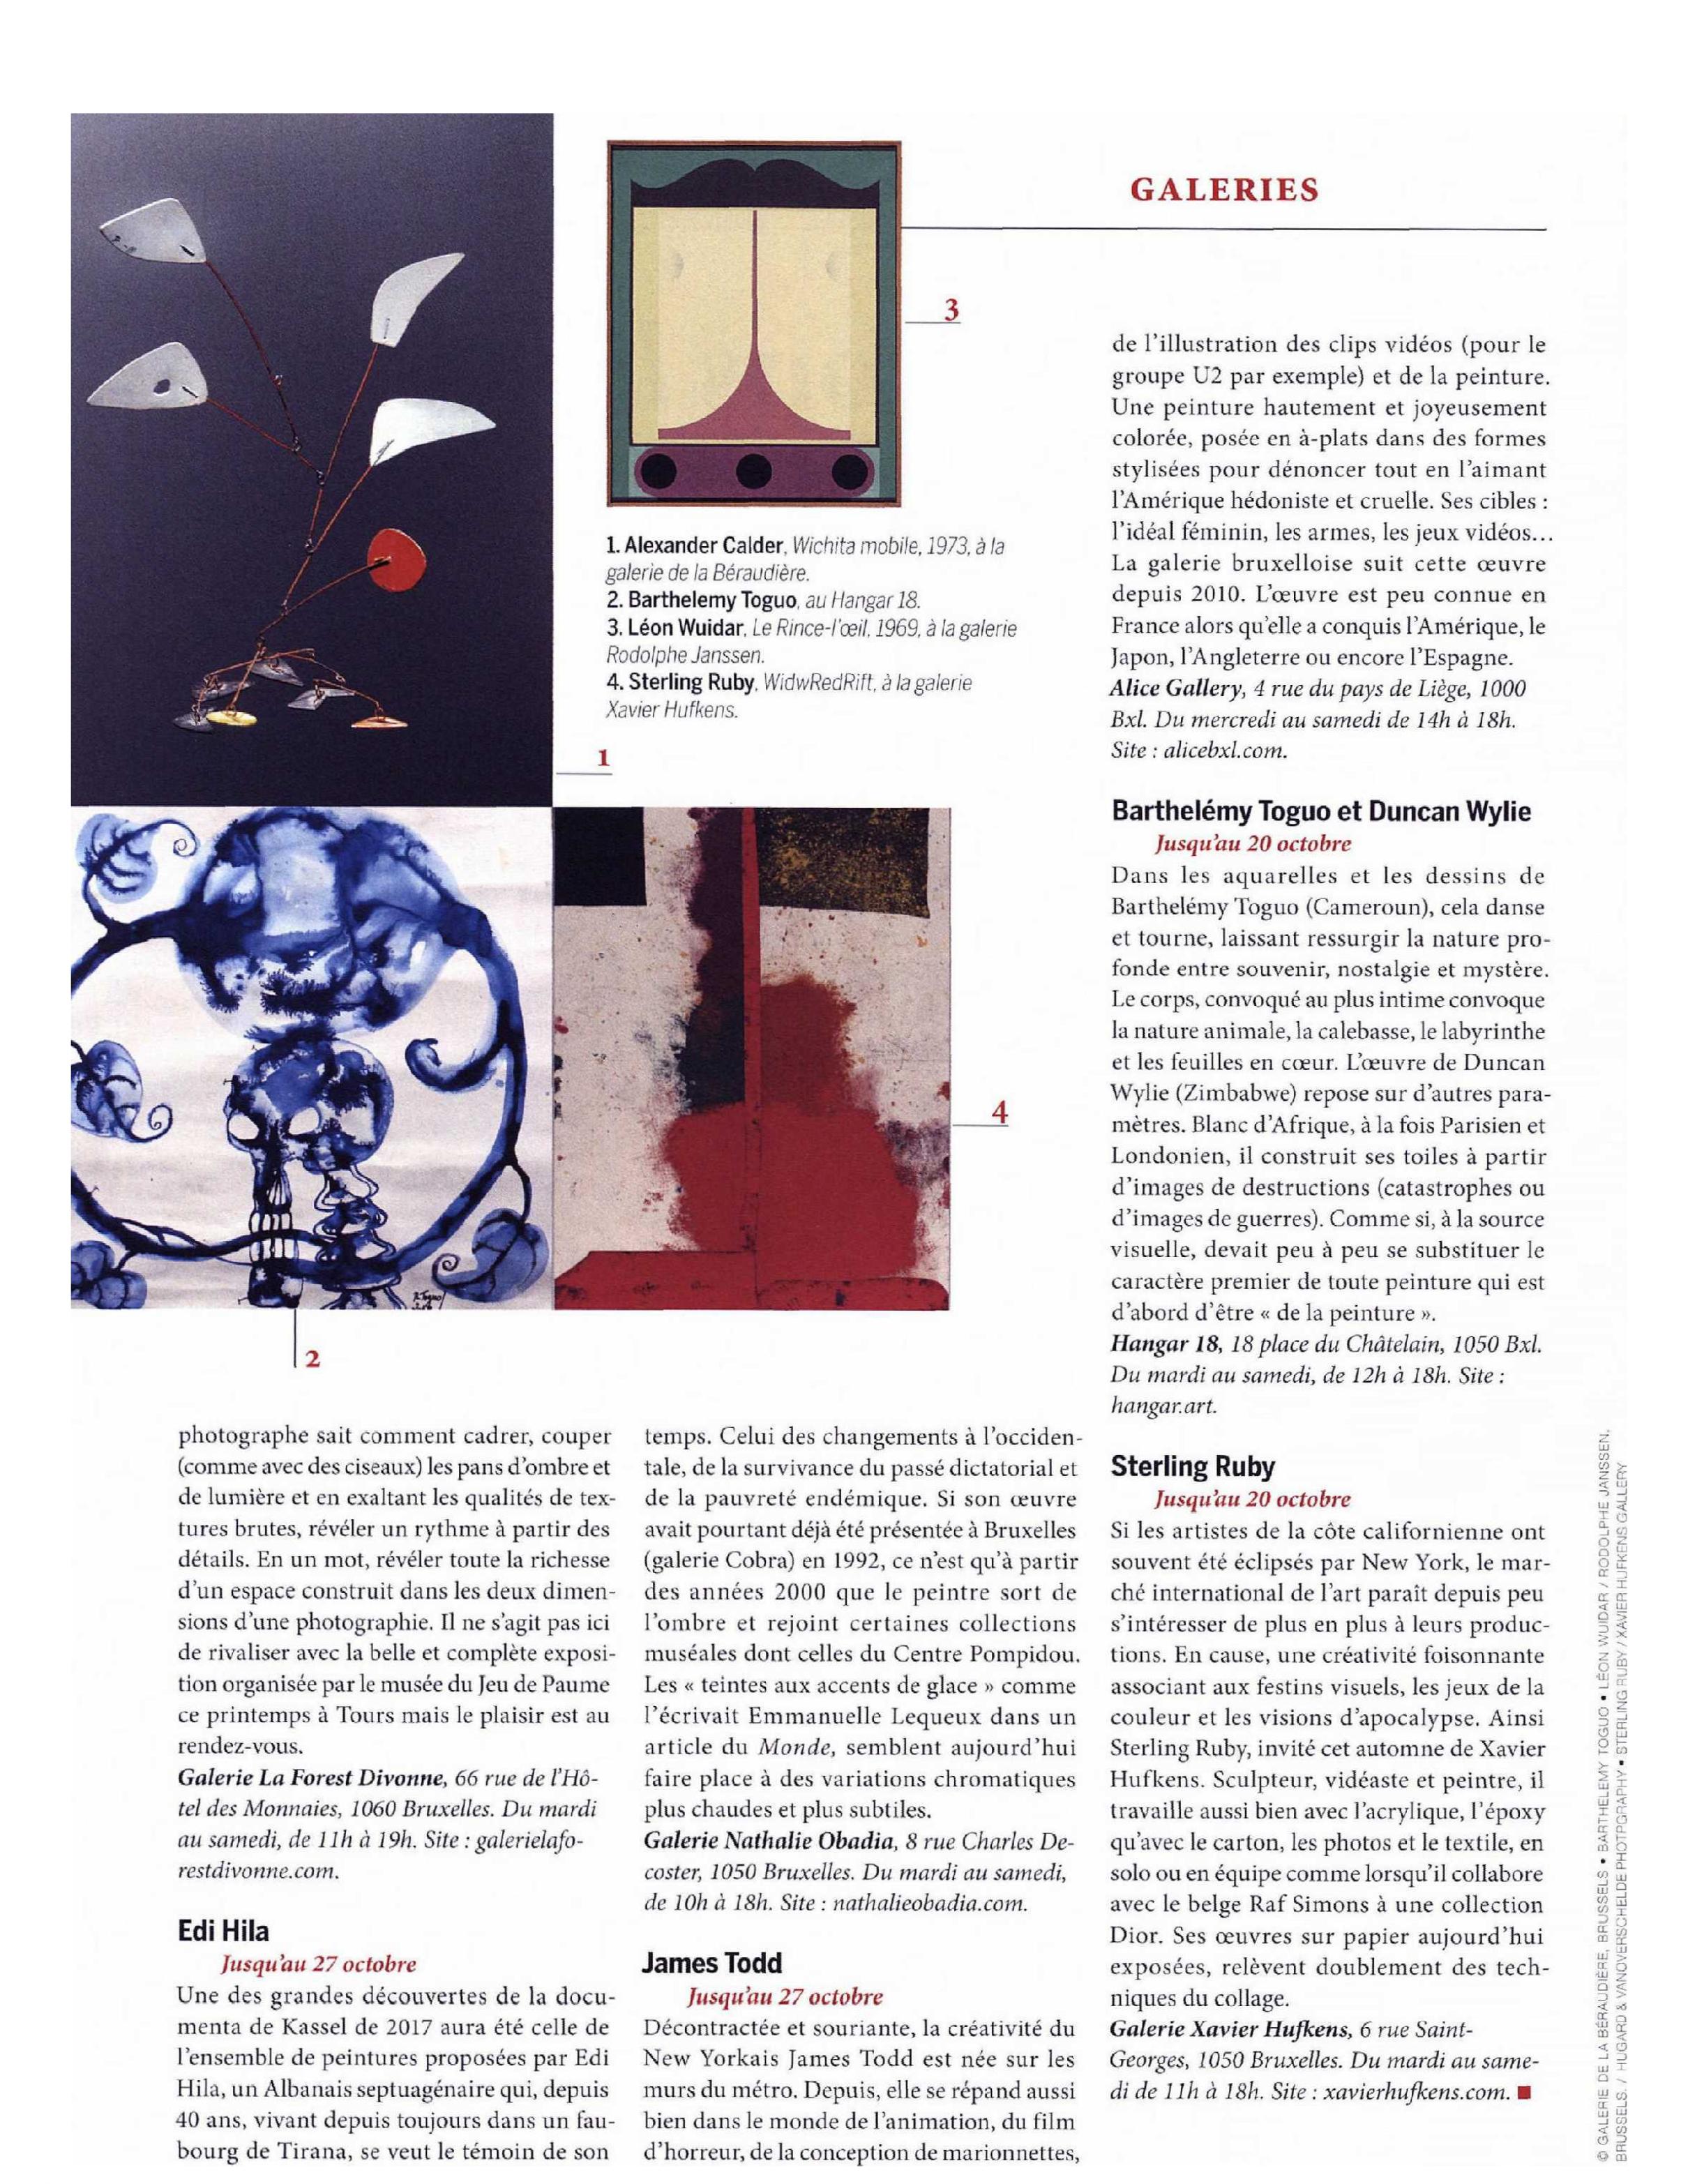 2018.09.01-Juliette+&+Victor+Magazine+-Expression+libres-2.jpg